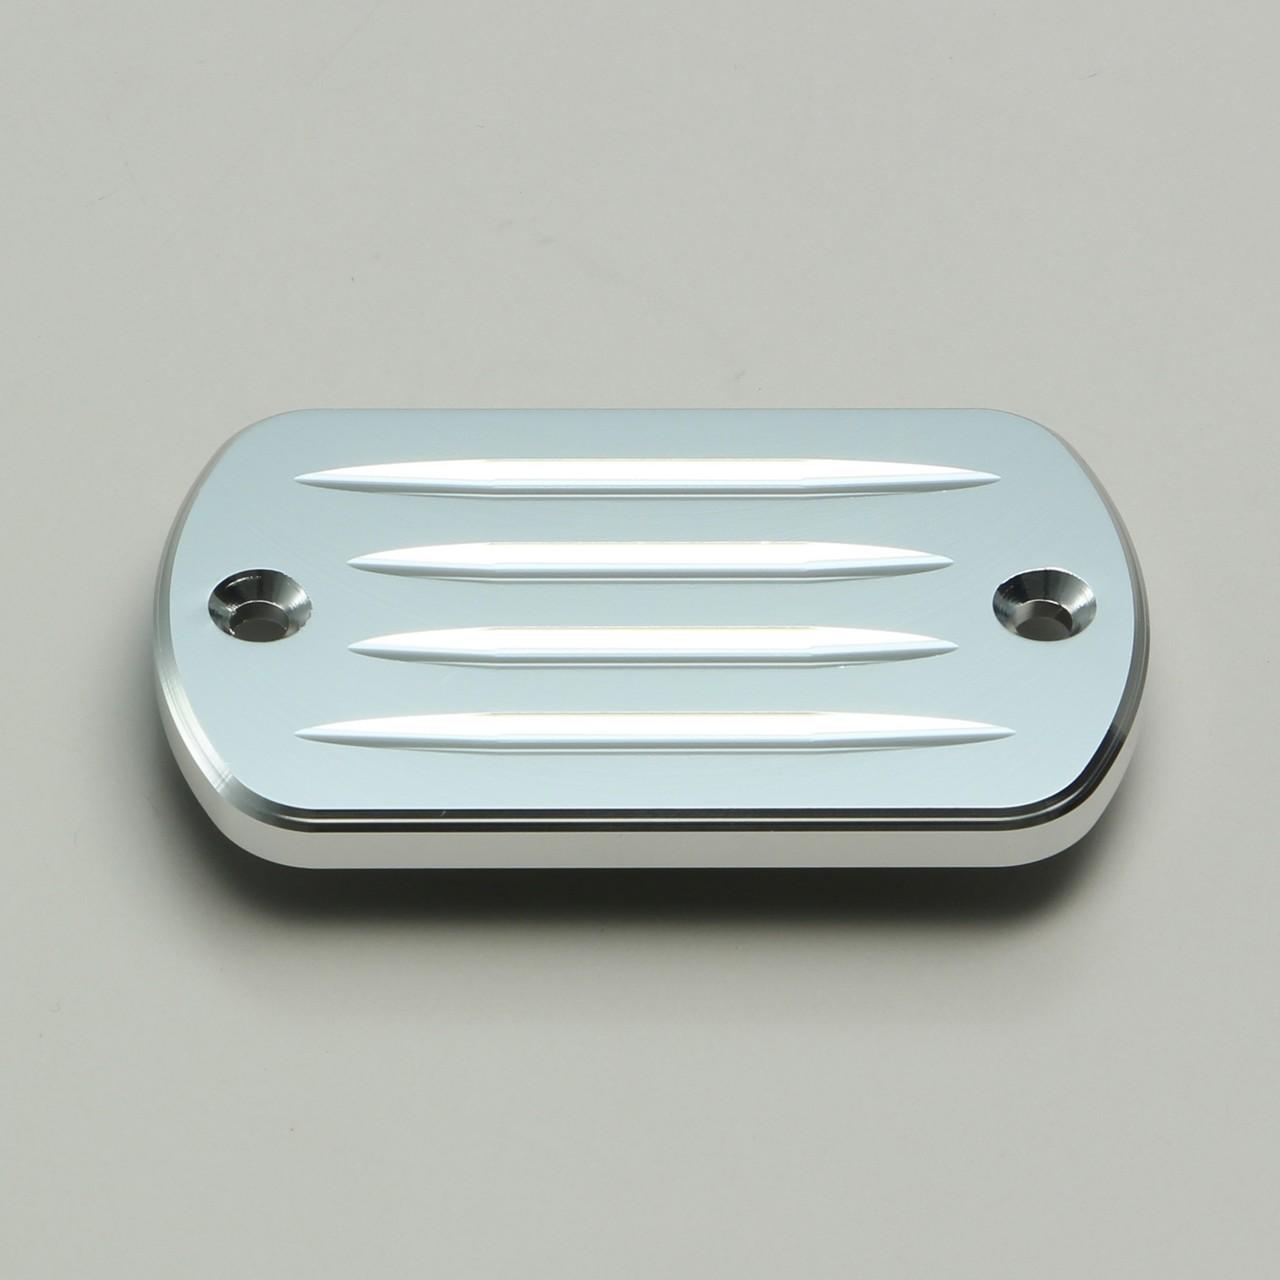 【HURRICANE】主缸蓋 - 「Webike-摩托百貨」